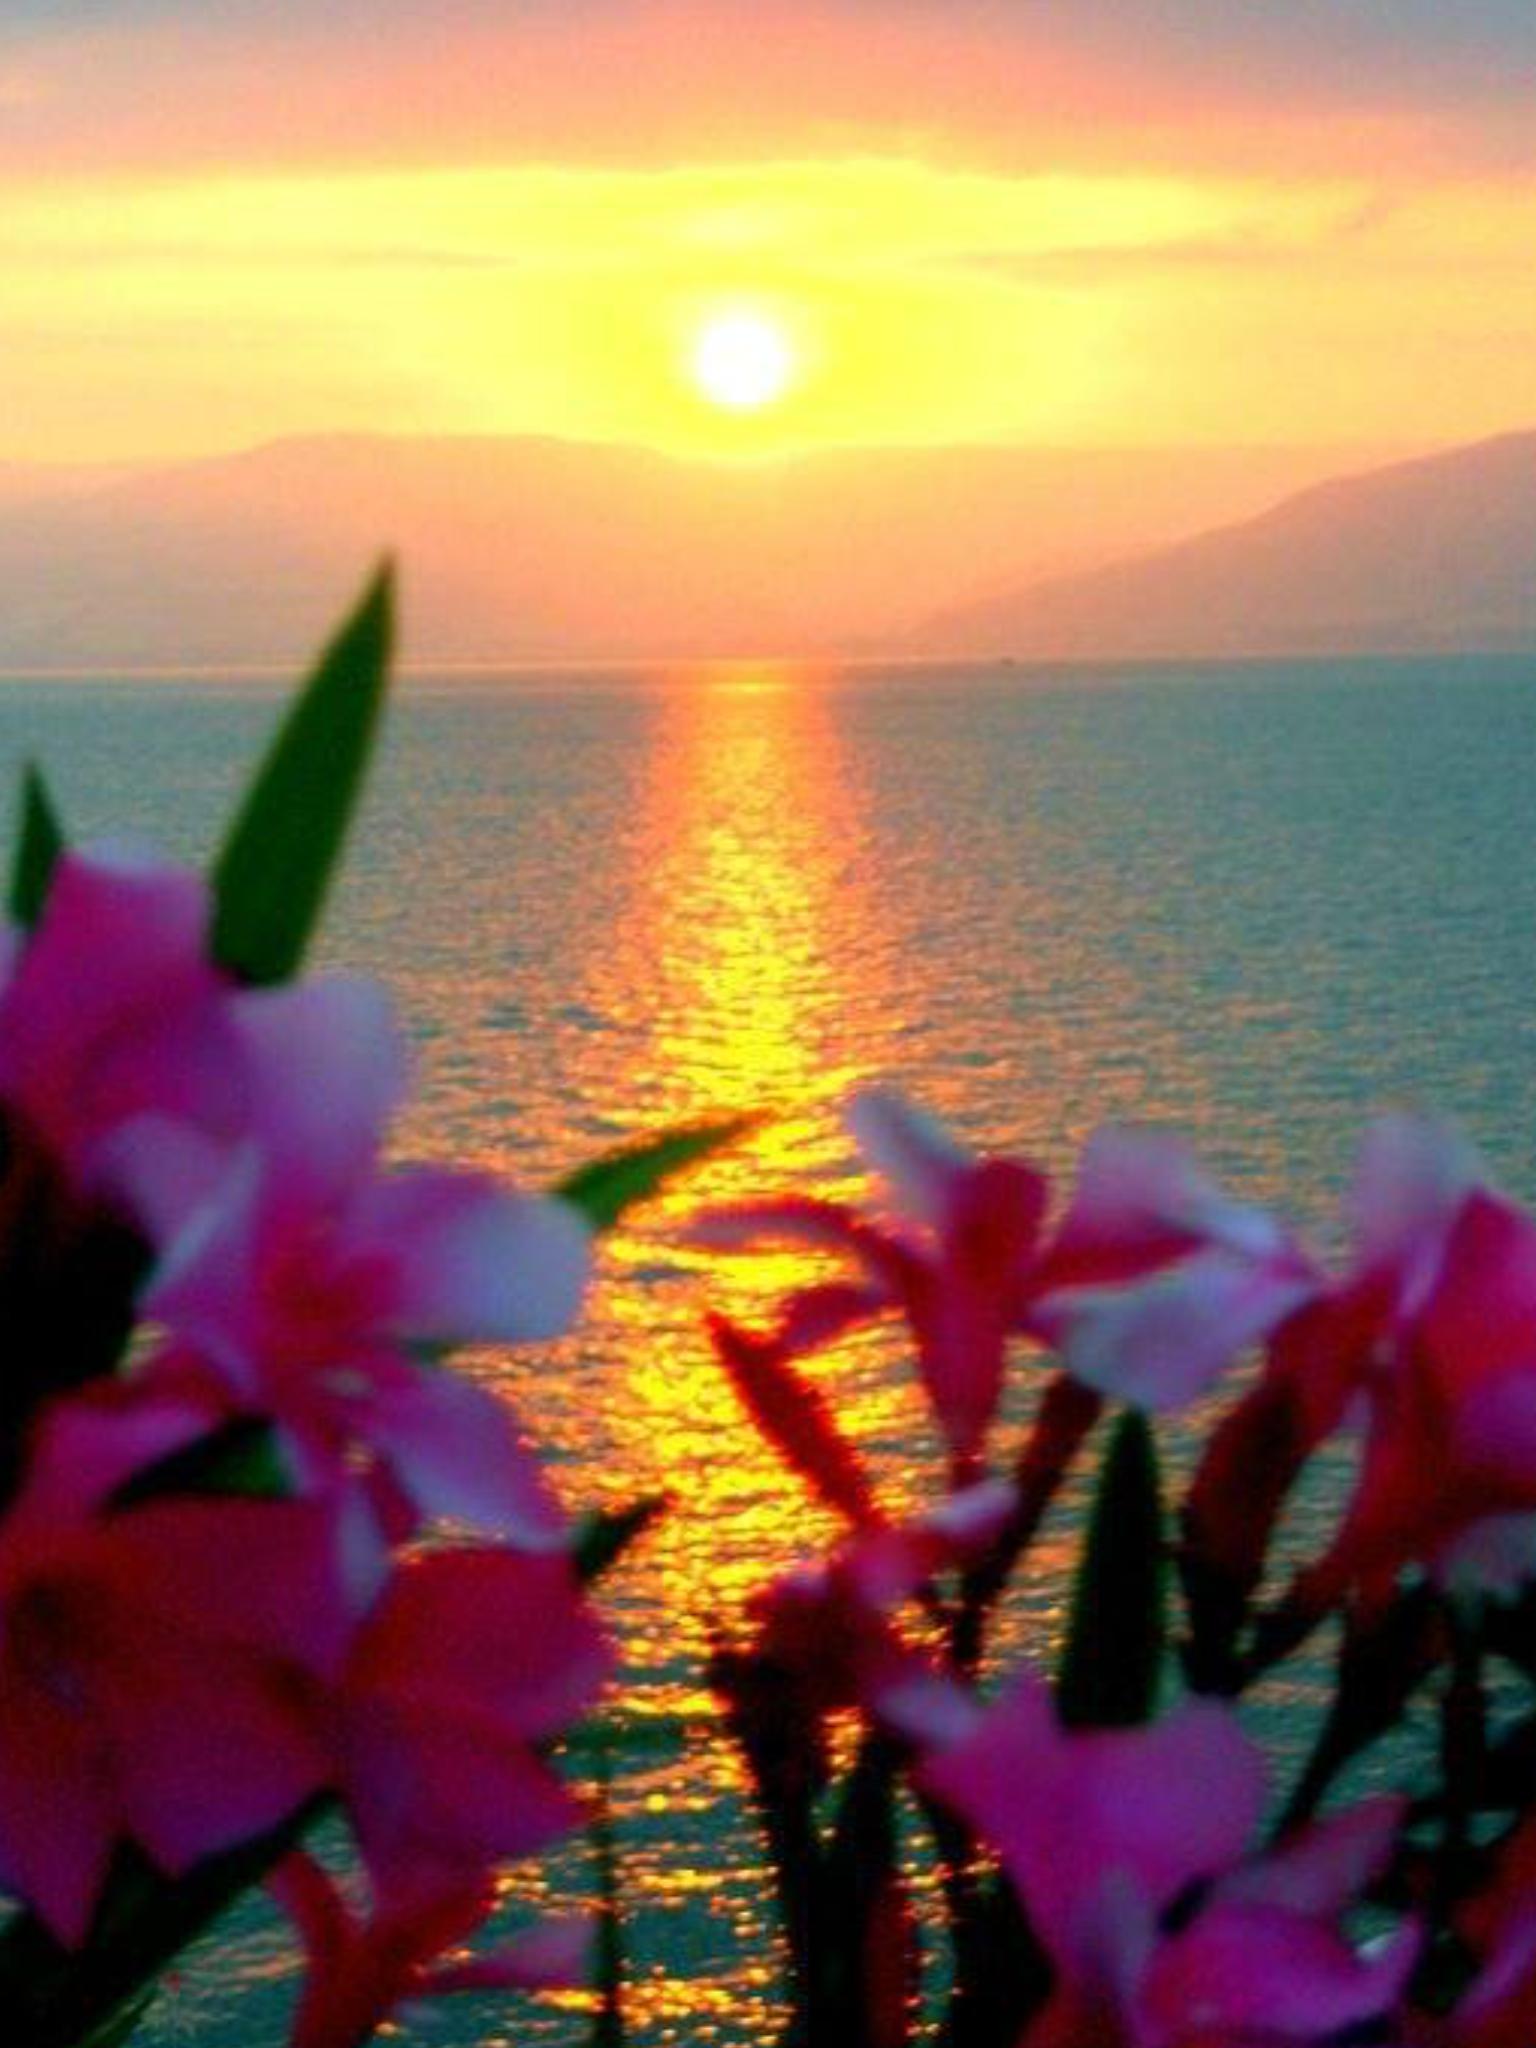 Moonskyamazng Natureflowers The Beauty Surrounds Me